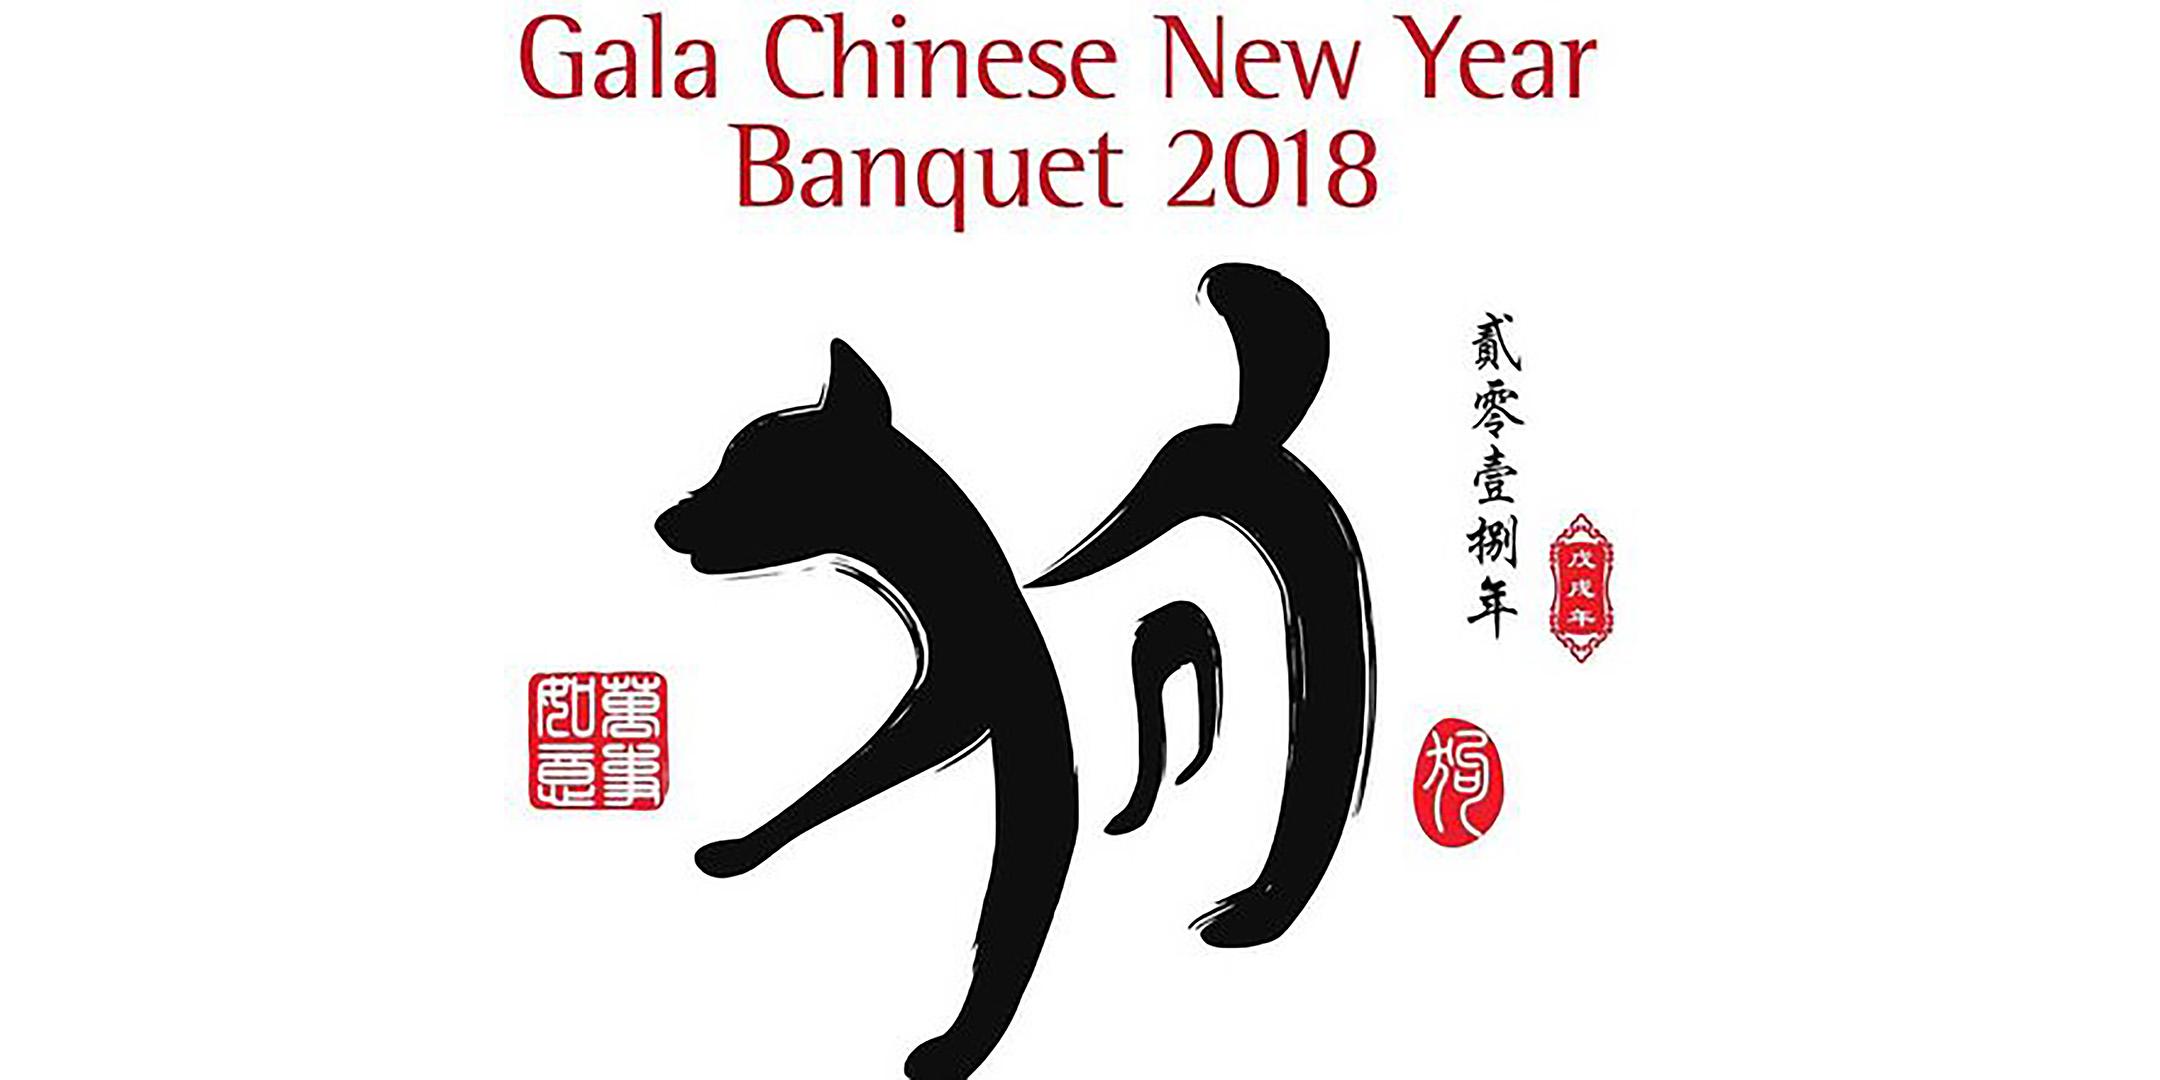 rsz_banquet_invitation_2018_2160x1080.jpg